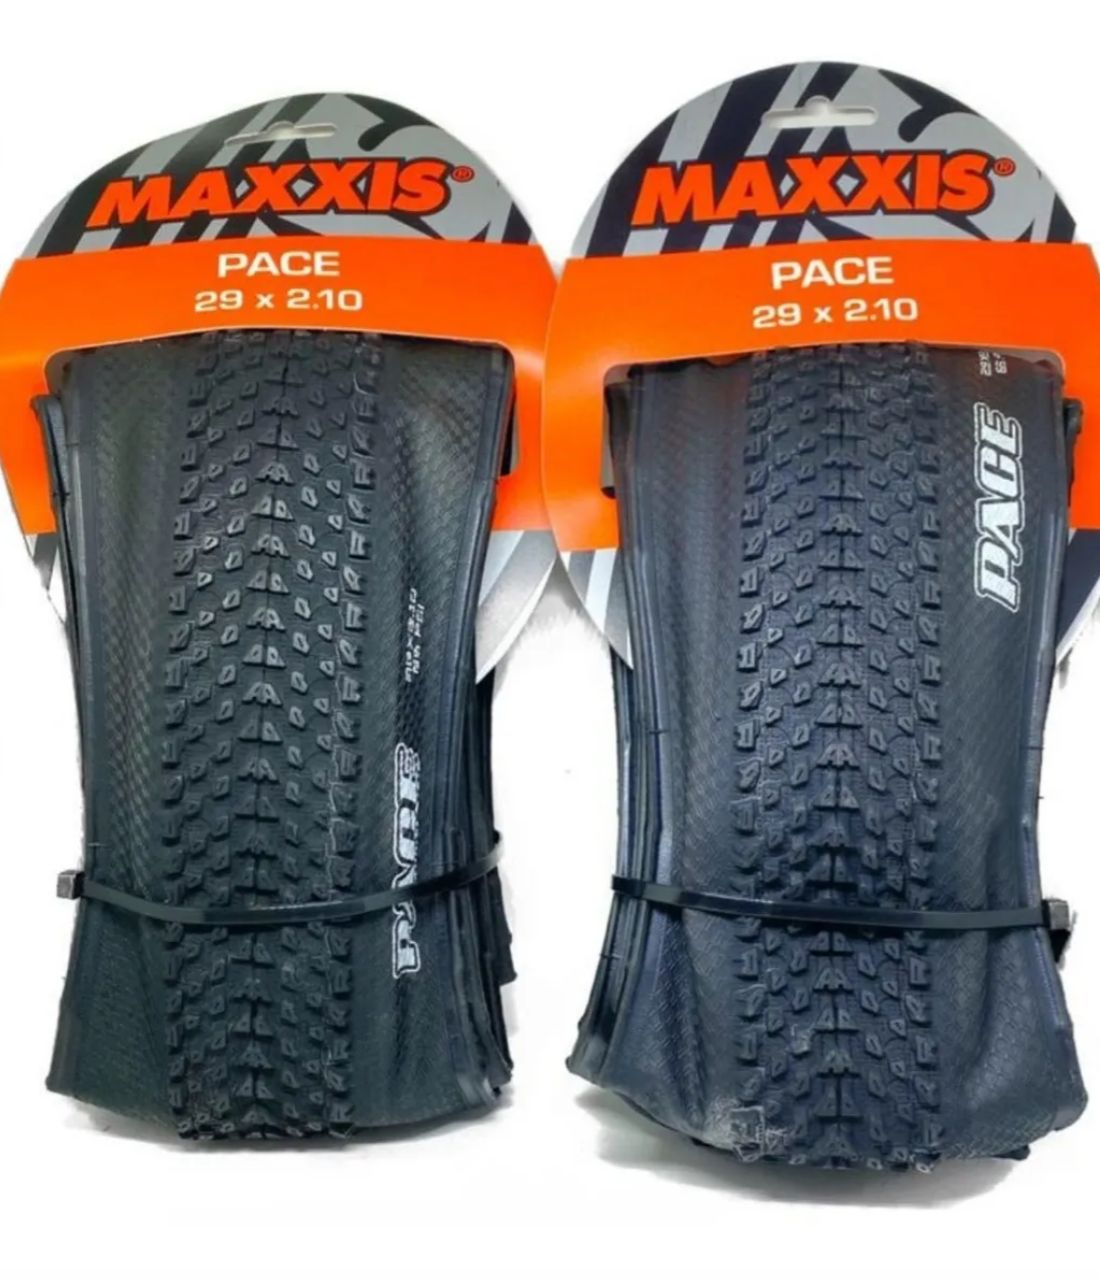 Pneu Maxxis Pace M333 29x2.10 Kevlar Dobrável 2 Unidades